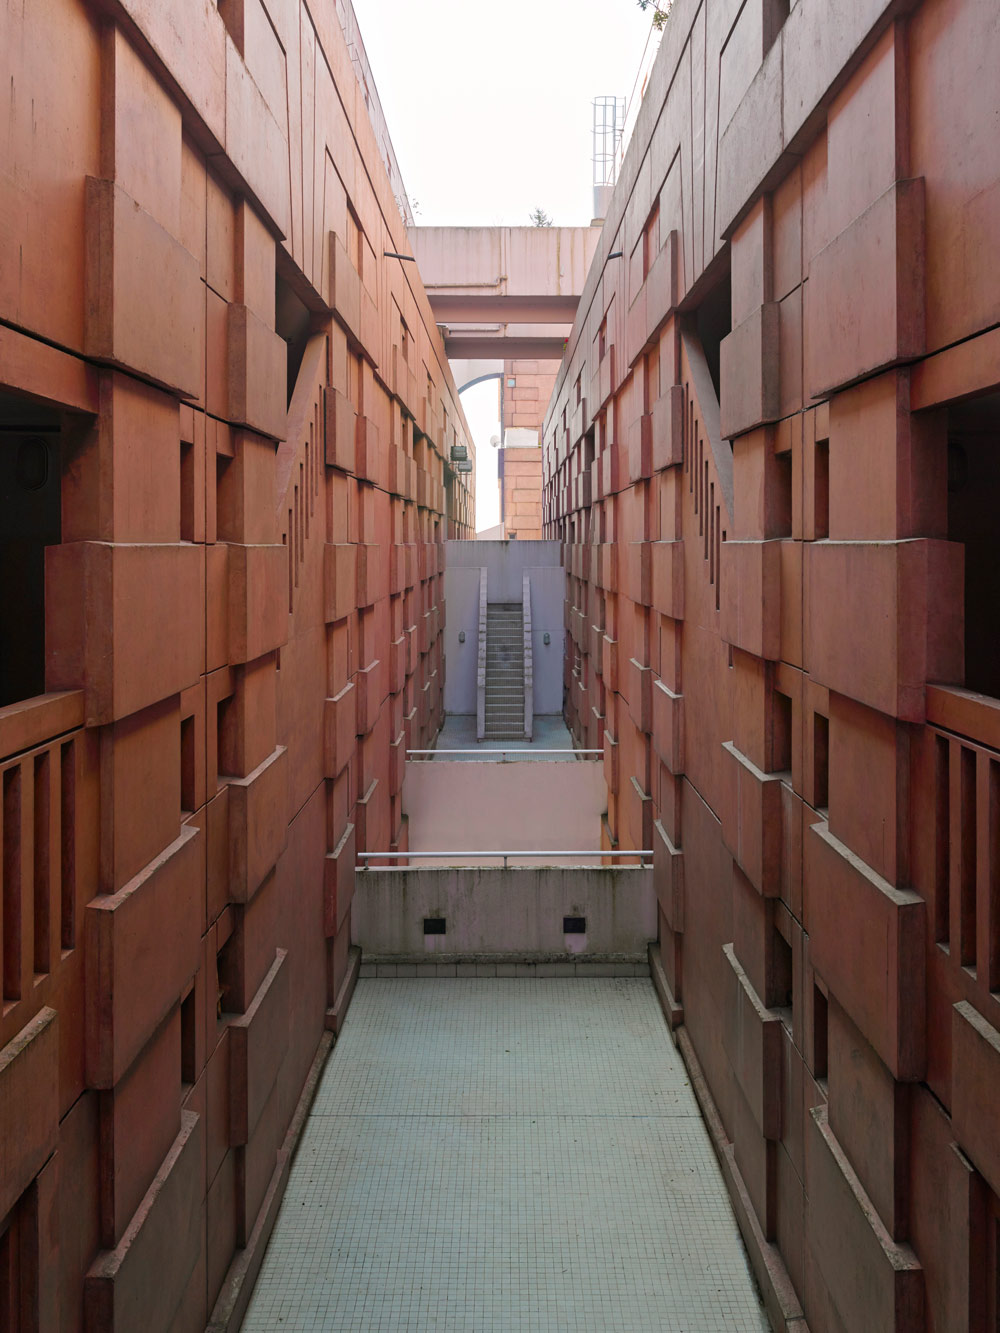 Espaces d 39 abraxas les utopies de ricardo bofill for Architecture noisy le grand